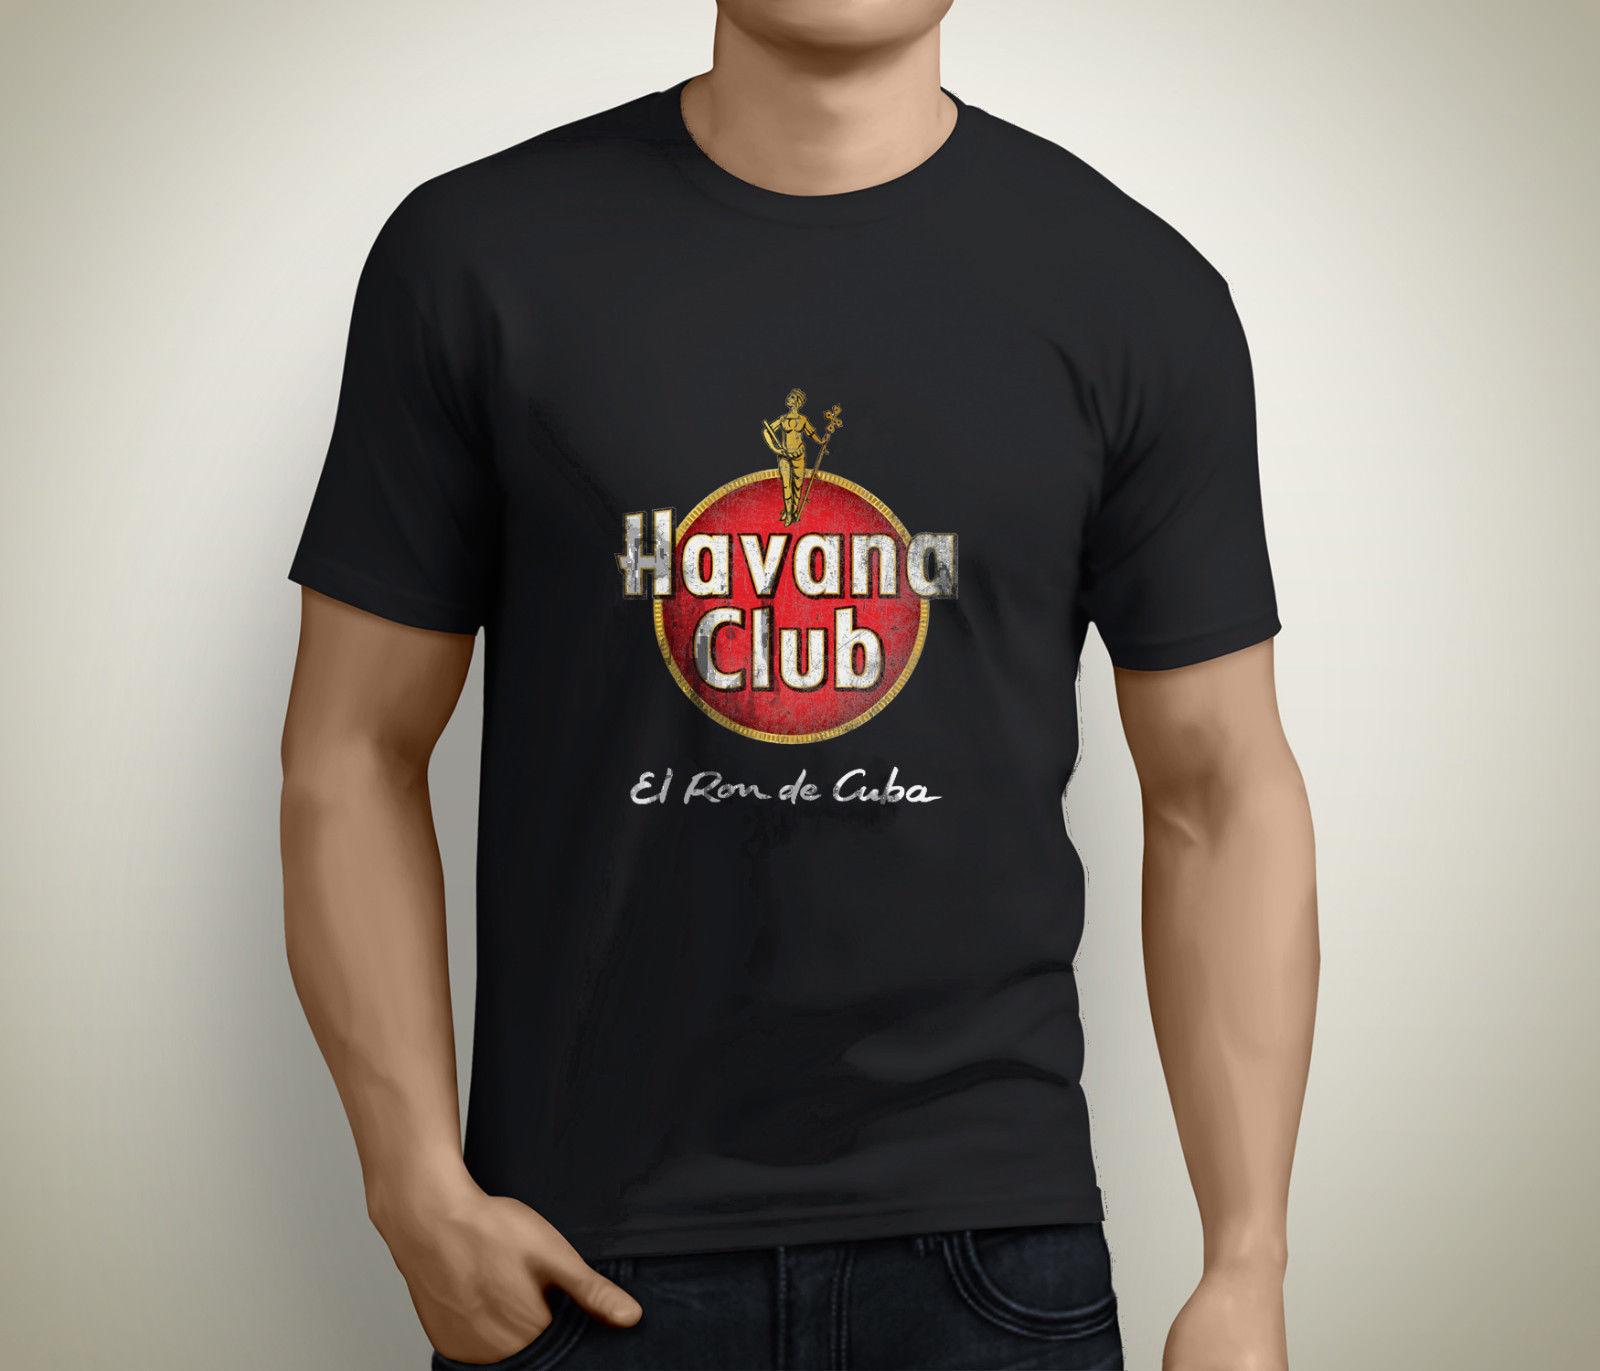 New Havana Club Kuba Cuba Party DJ Che Guevara Gr Mens Black T-Shirt Size S-3XL Design Style New Fashion Short Sleeve T Shirt